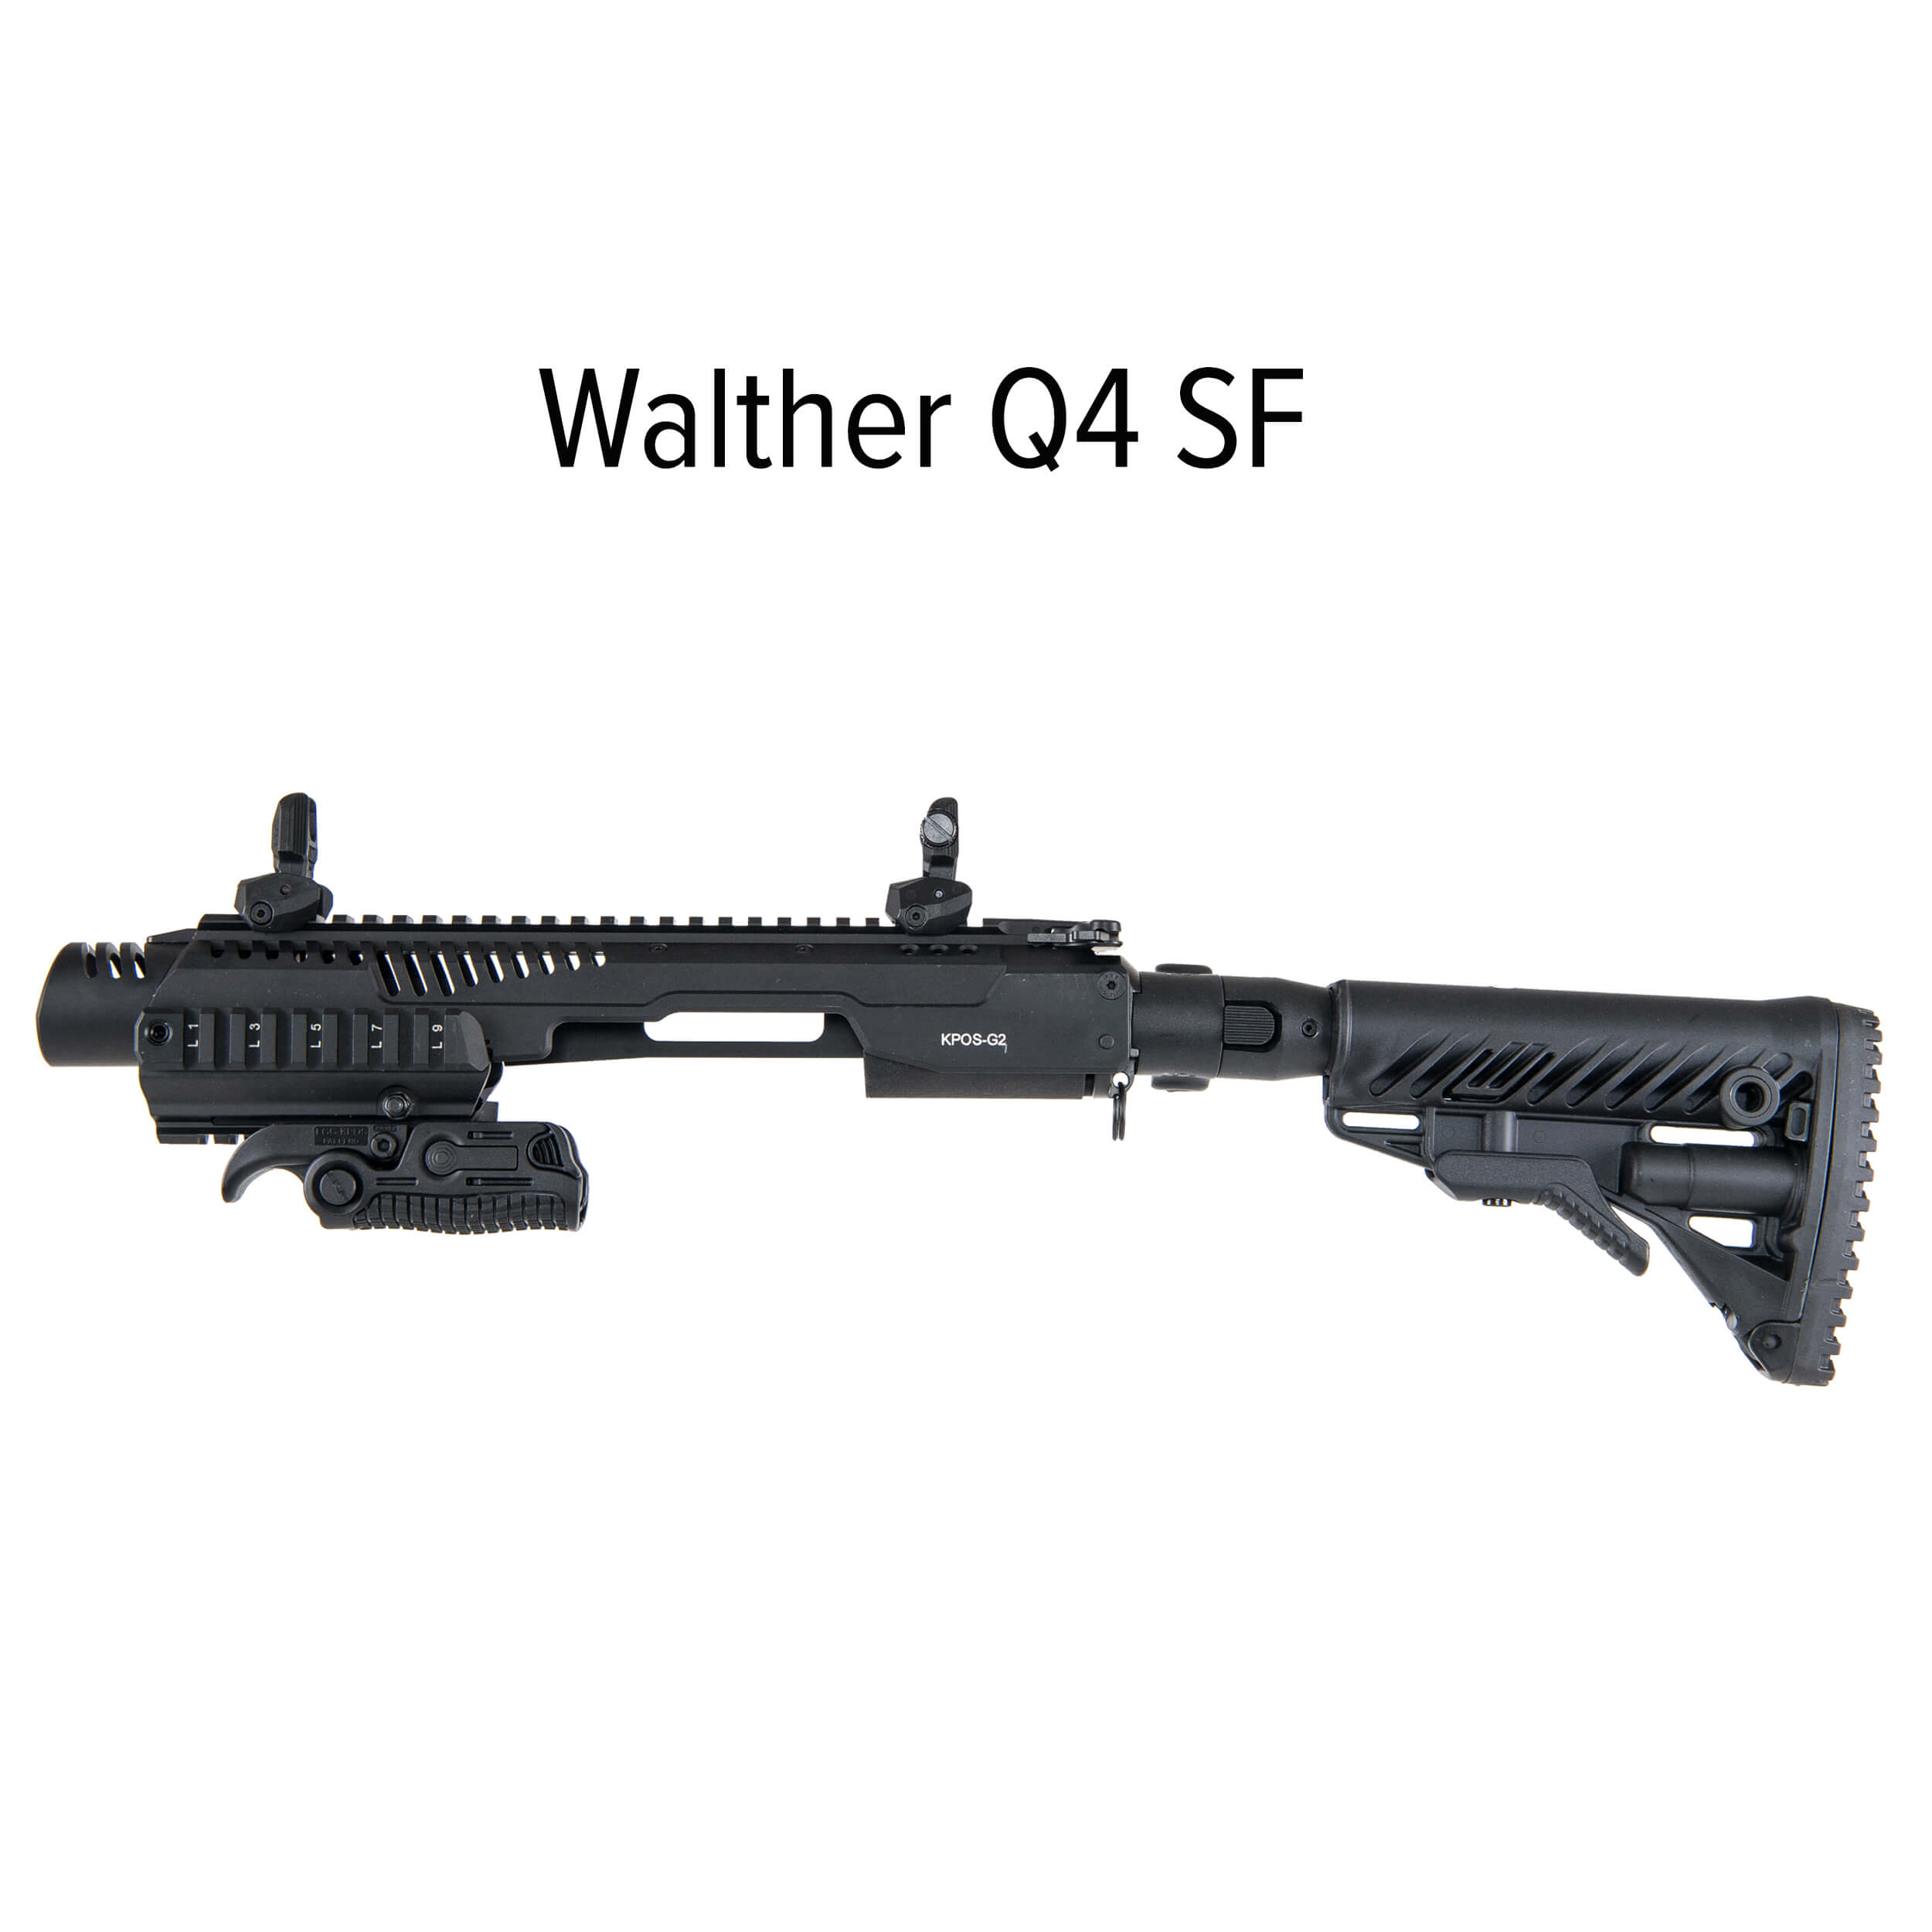 KPOS G2C Walther Q4 SF